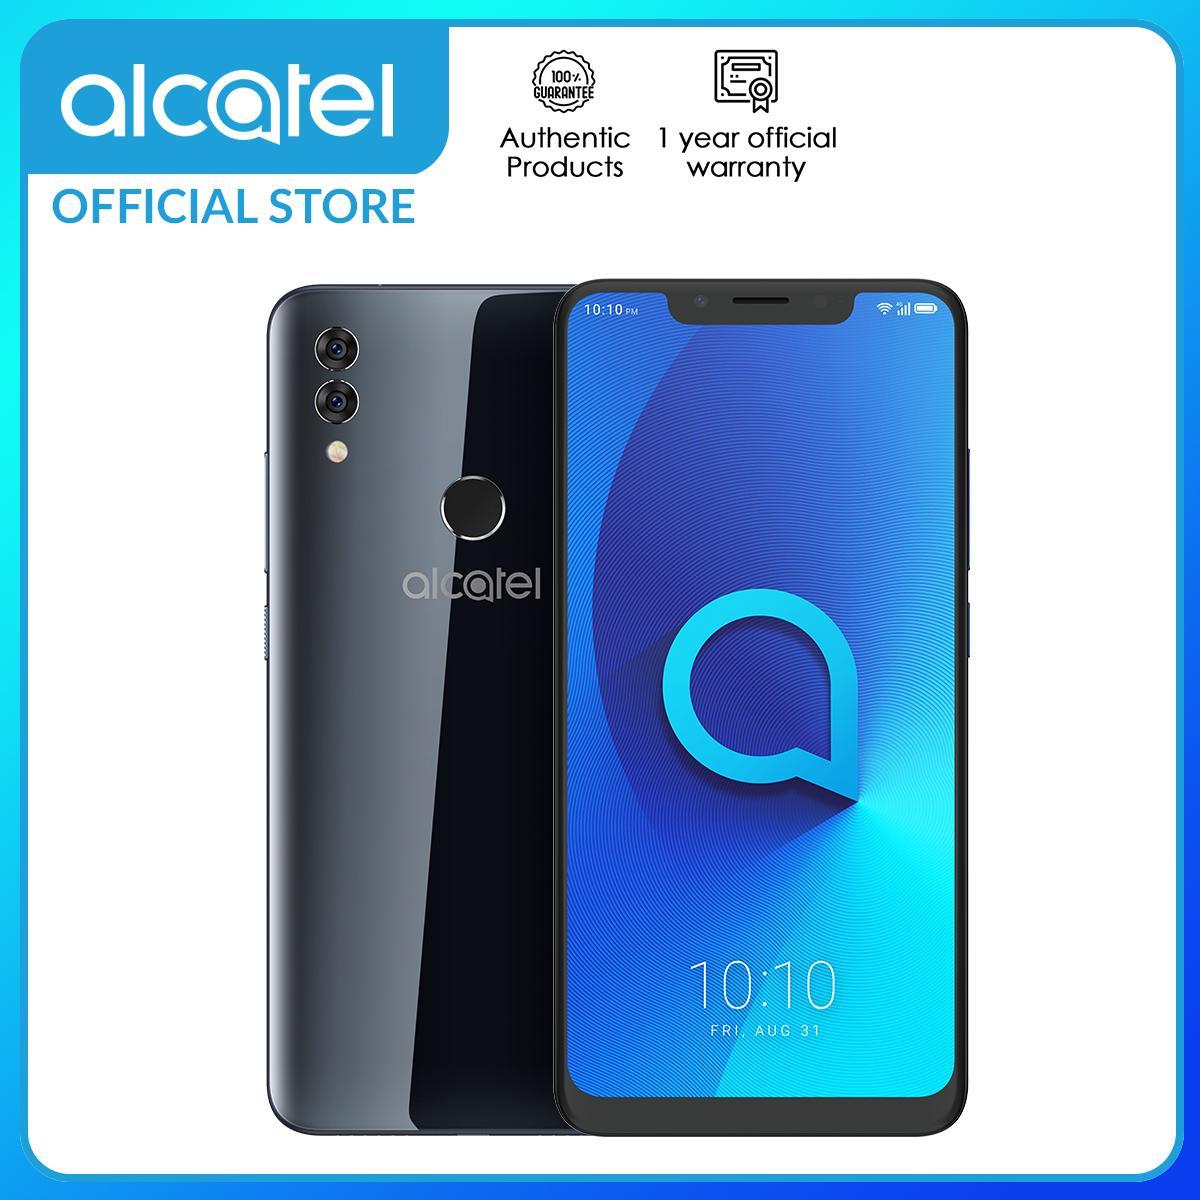 Alcatel Phone Philippines - Alcatel Mobile for sale - prices